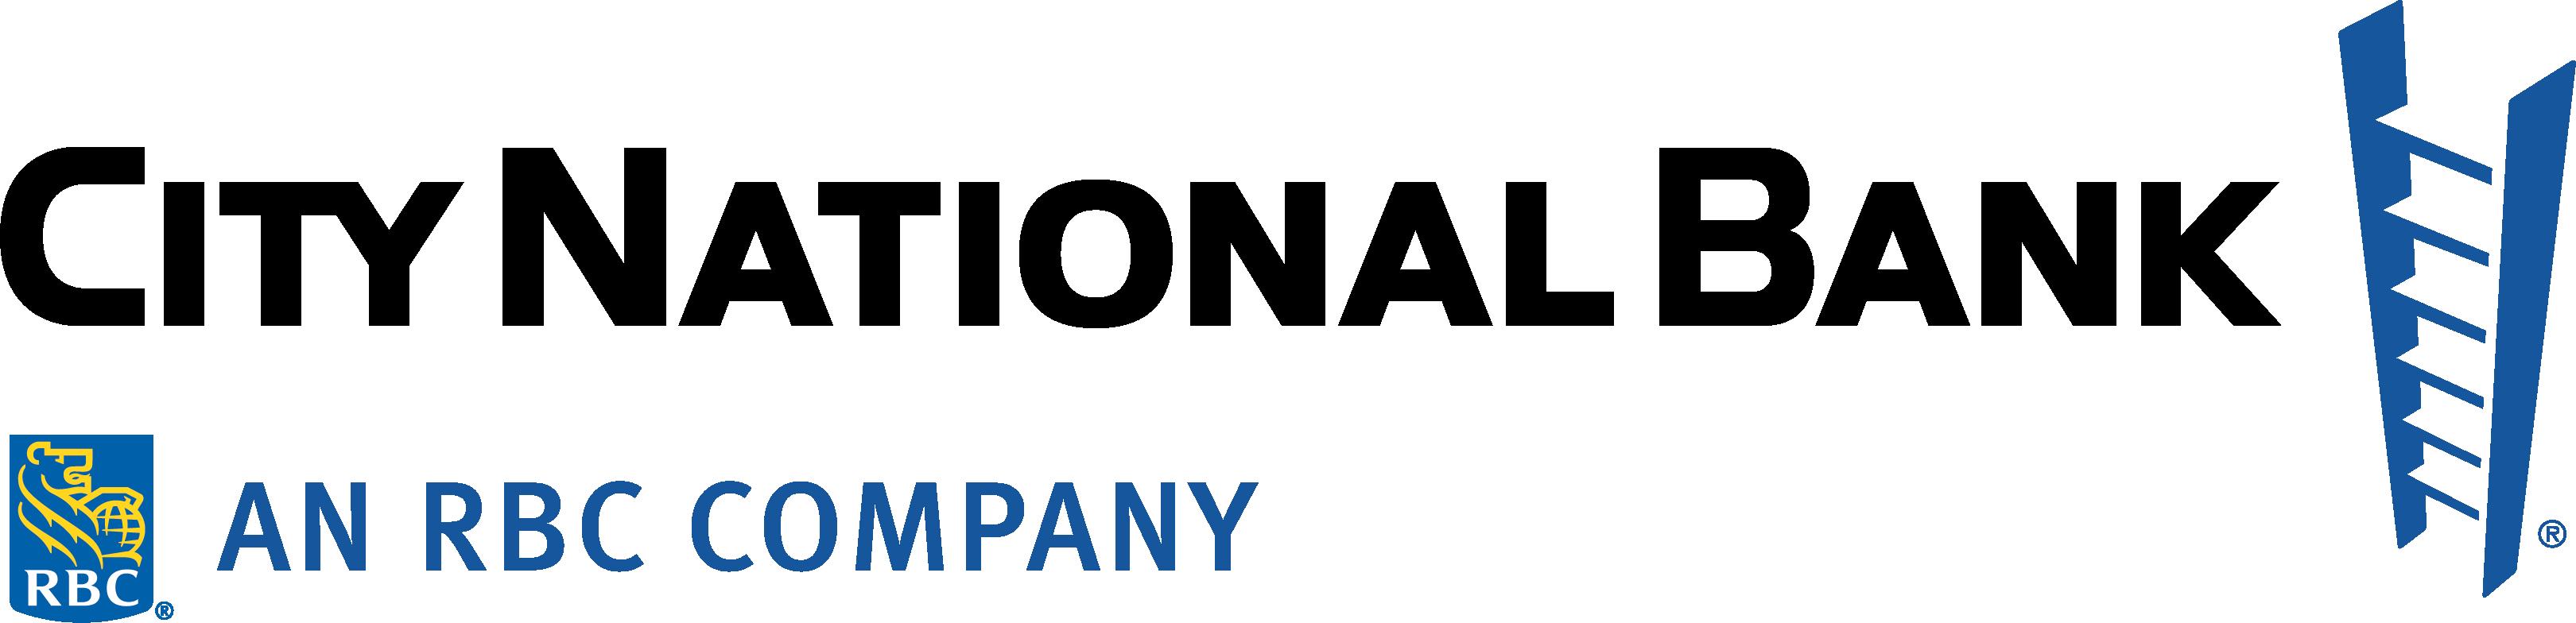 City National Bank Summit Sponsor 2020